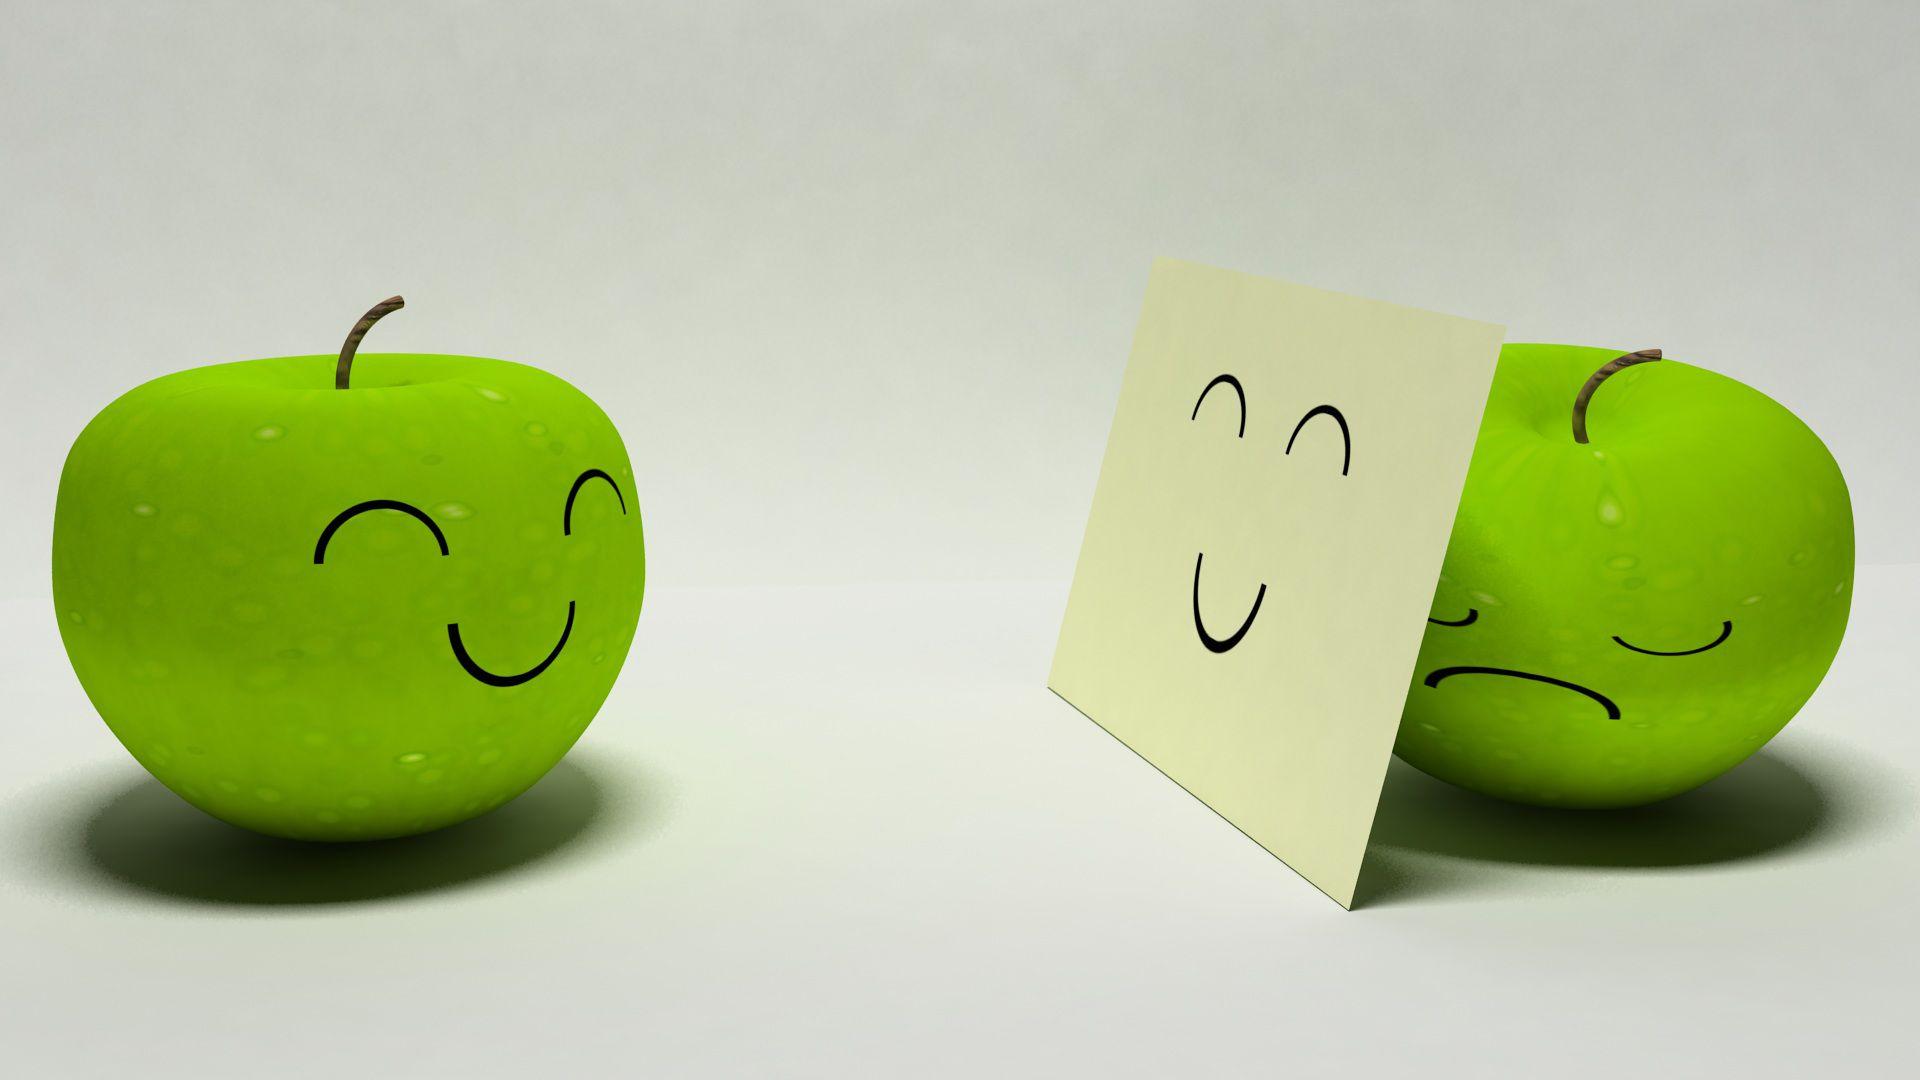 Sad clipart apple #8